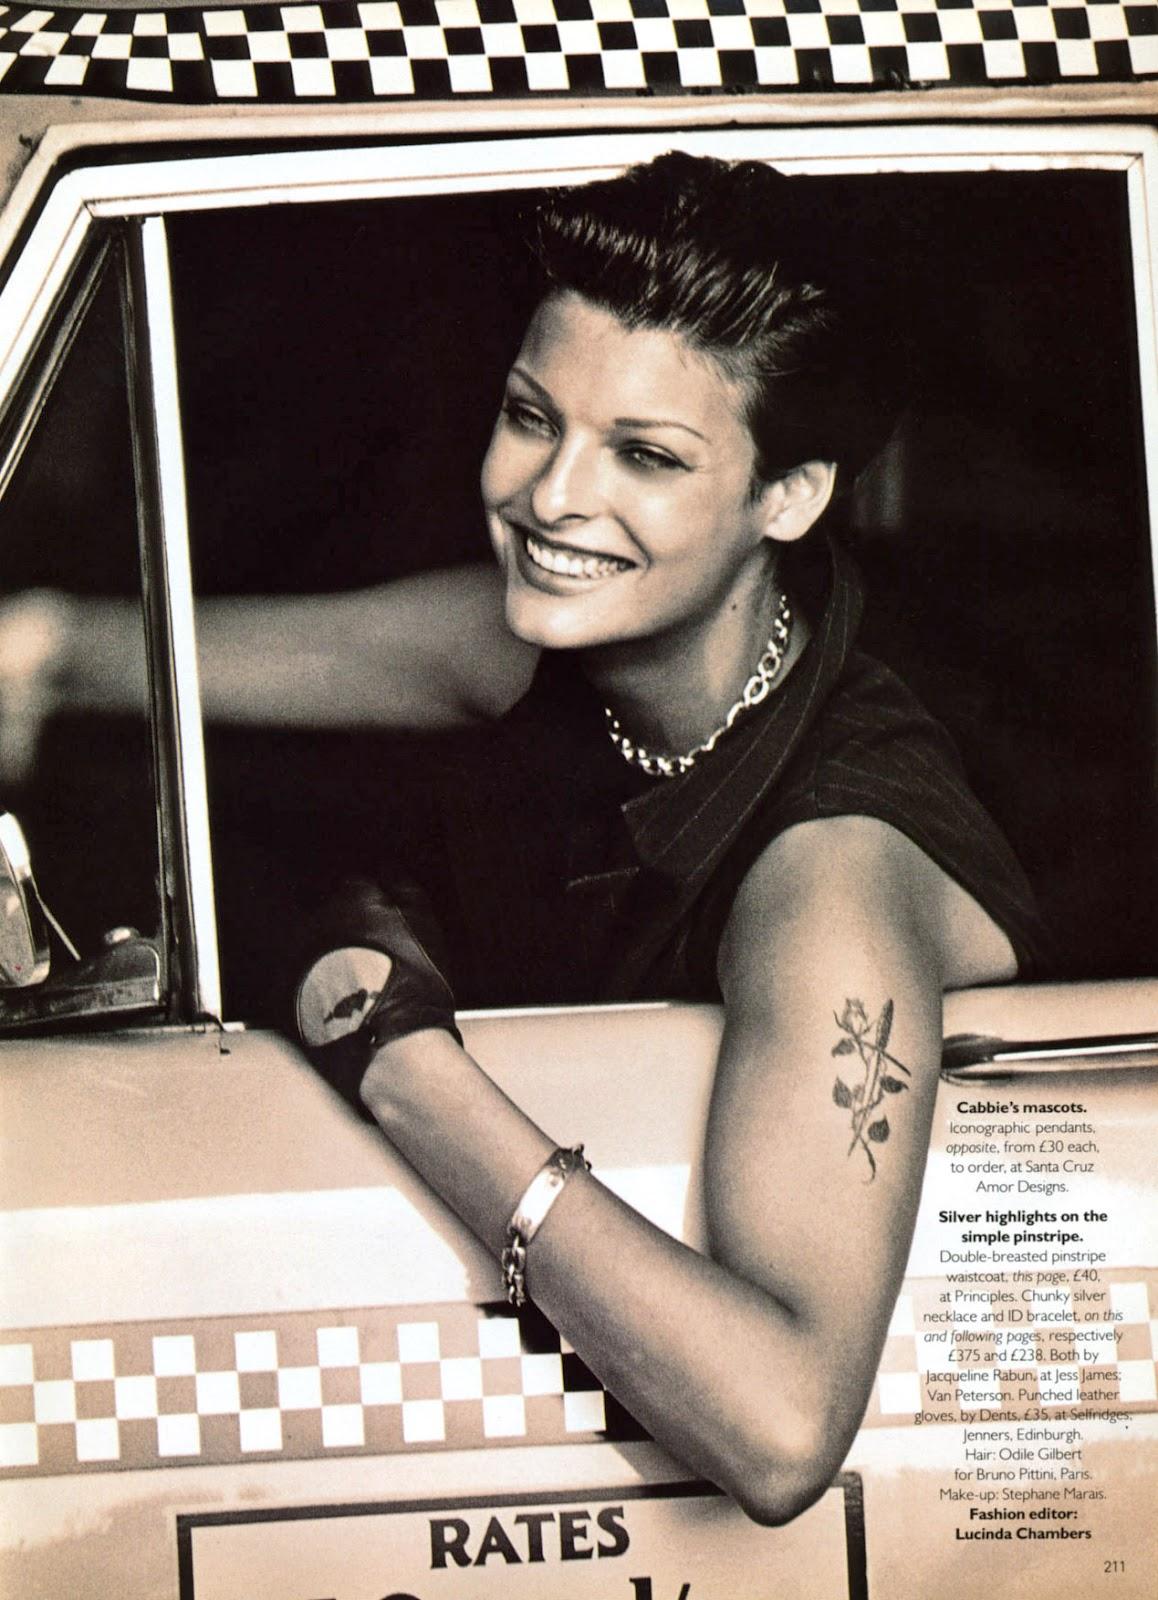 http://3.bp.blogspot.com/-XMvdNGMR3uw/T0-1hhSIi4I/AAAAAAAAC5Y/O-oRLXvY4Wg/s1600/Linda+Evangelista+1992+09+Vogue+Uk+Ph+Peter+Lindbergh+03.jpg